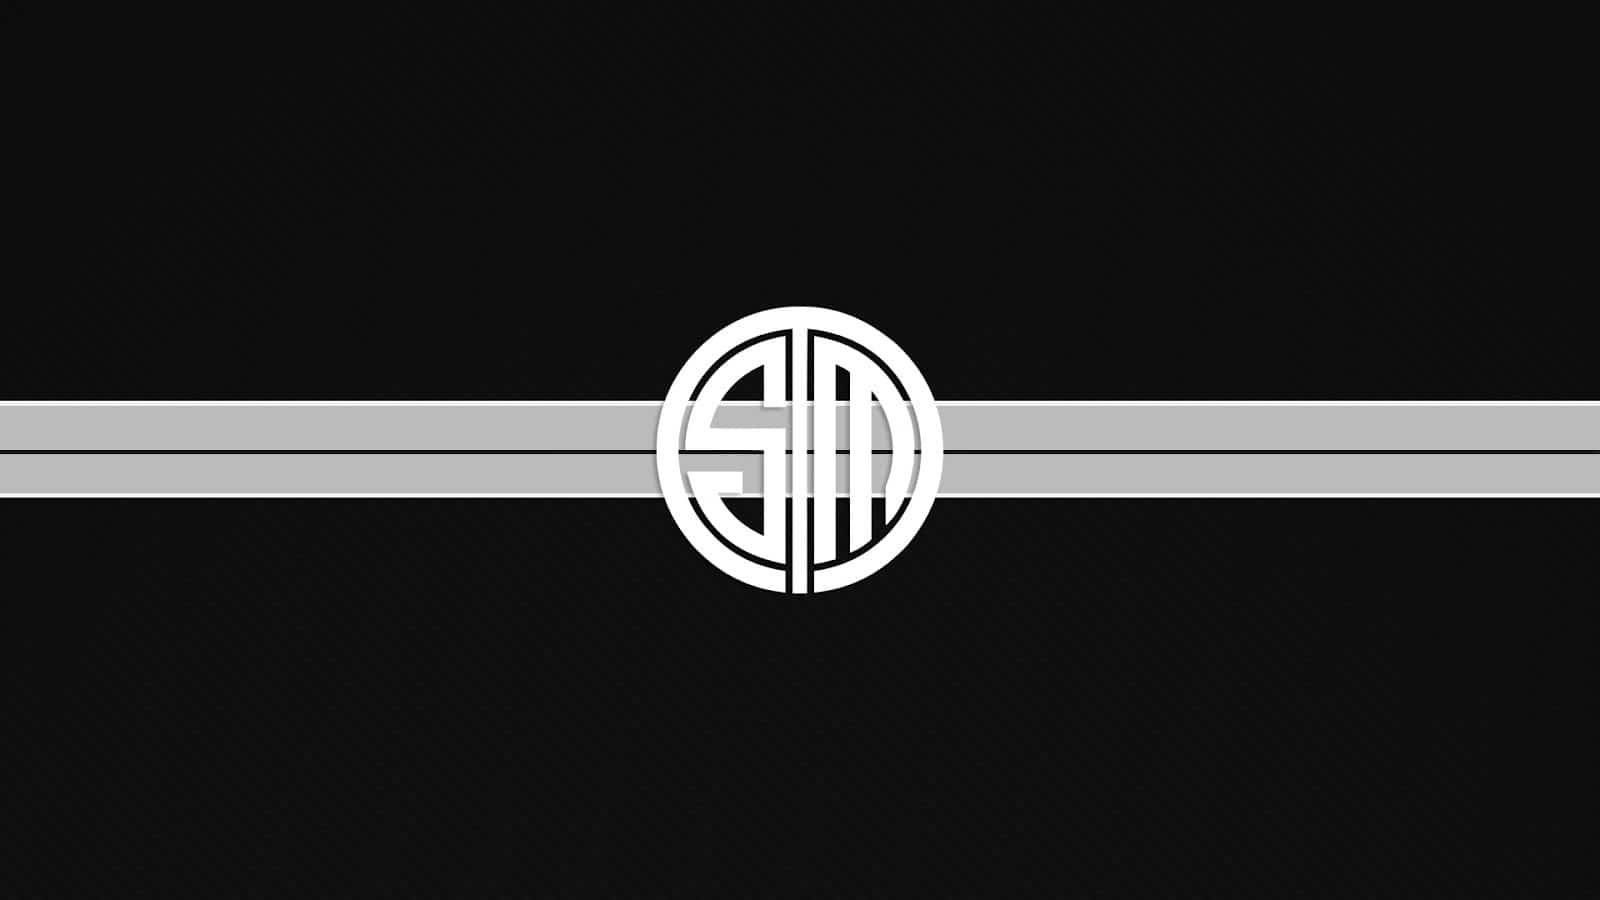 Team SoloMid Teases Return To Fortnite